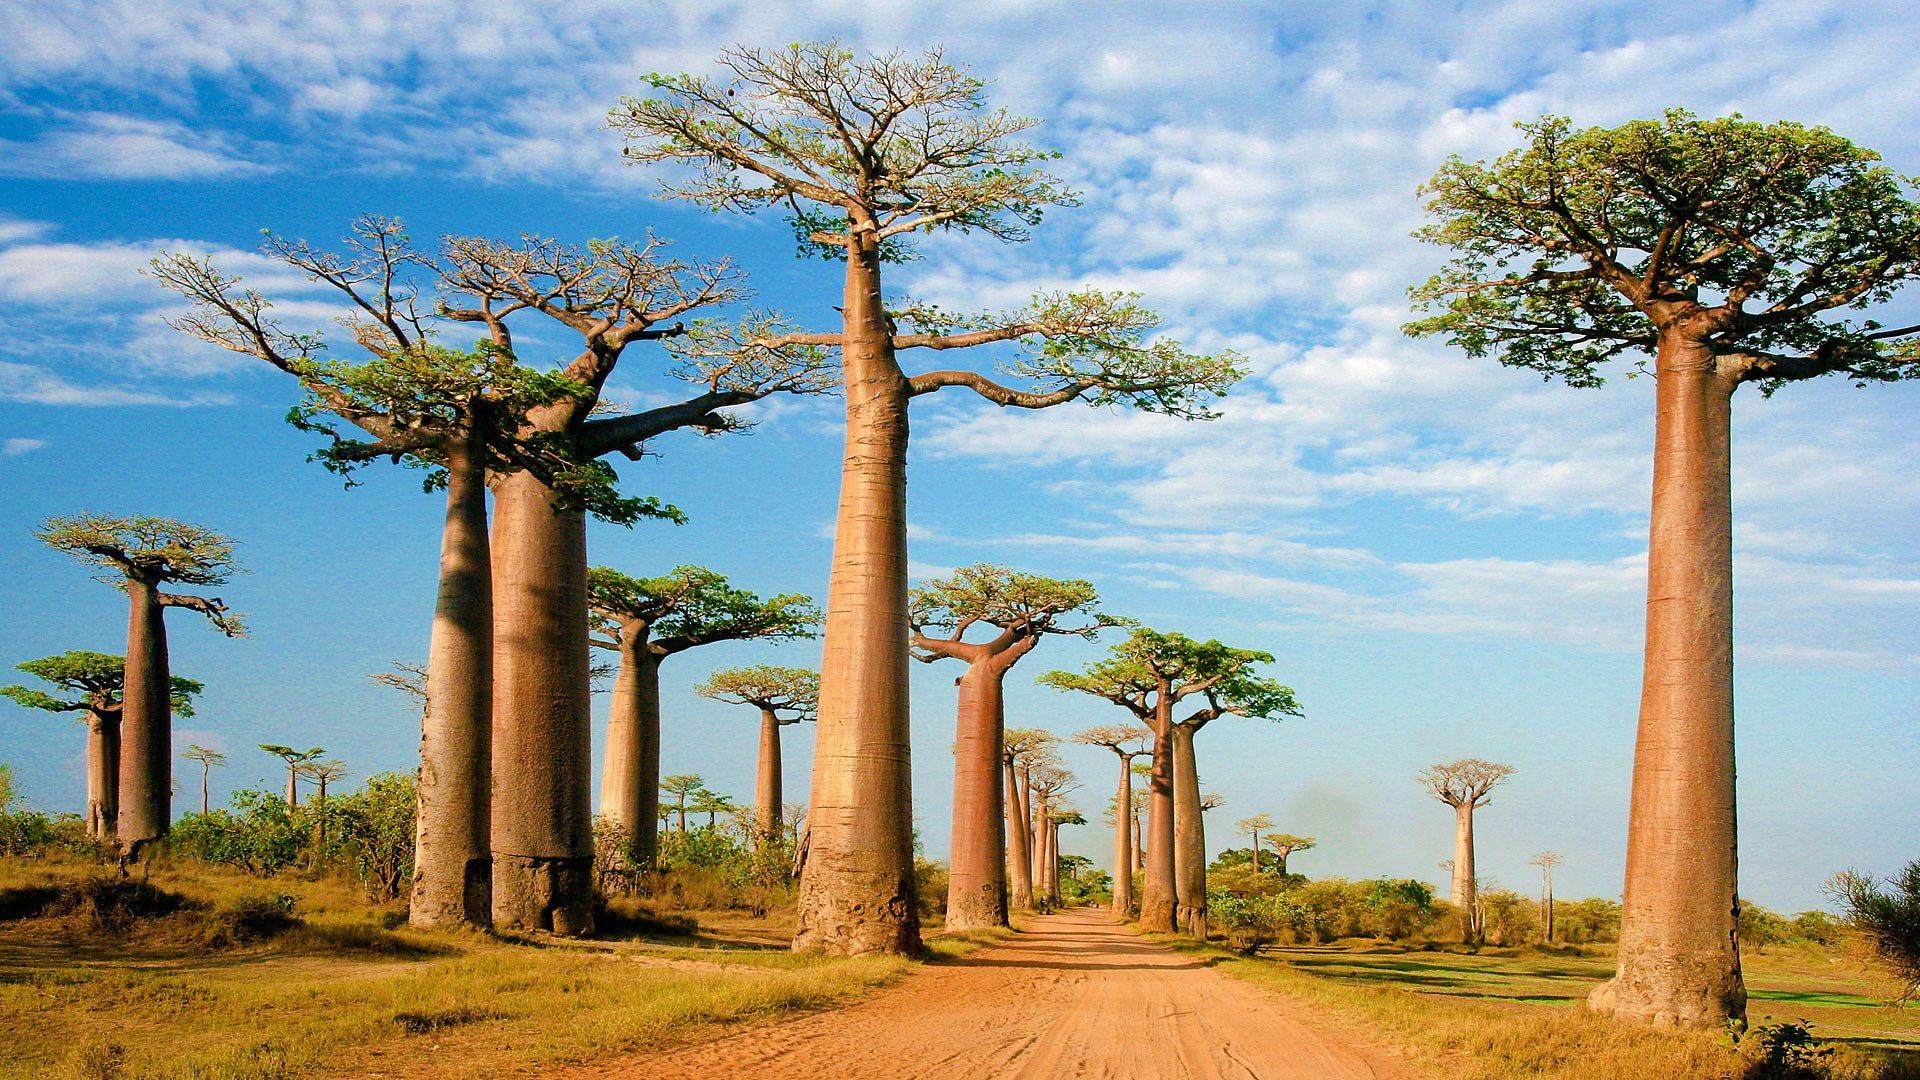 Cultivating baobab